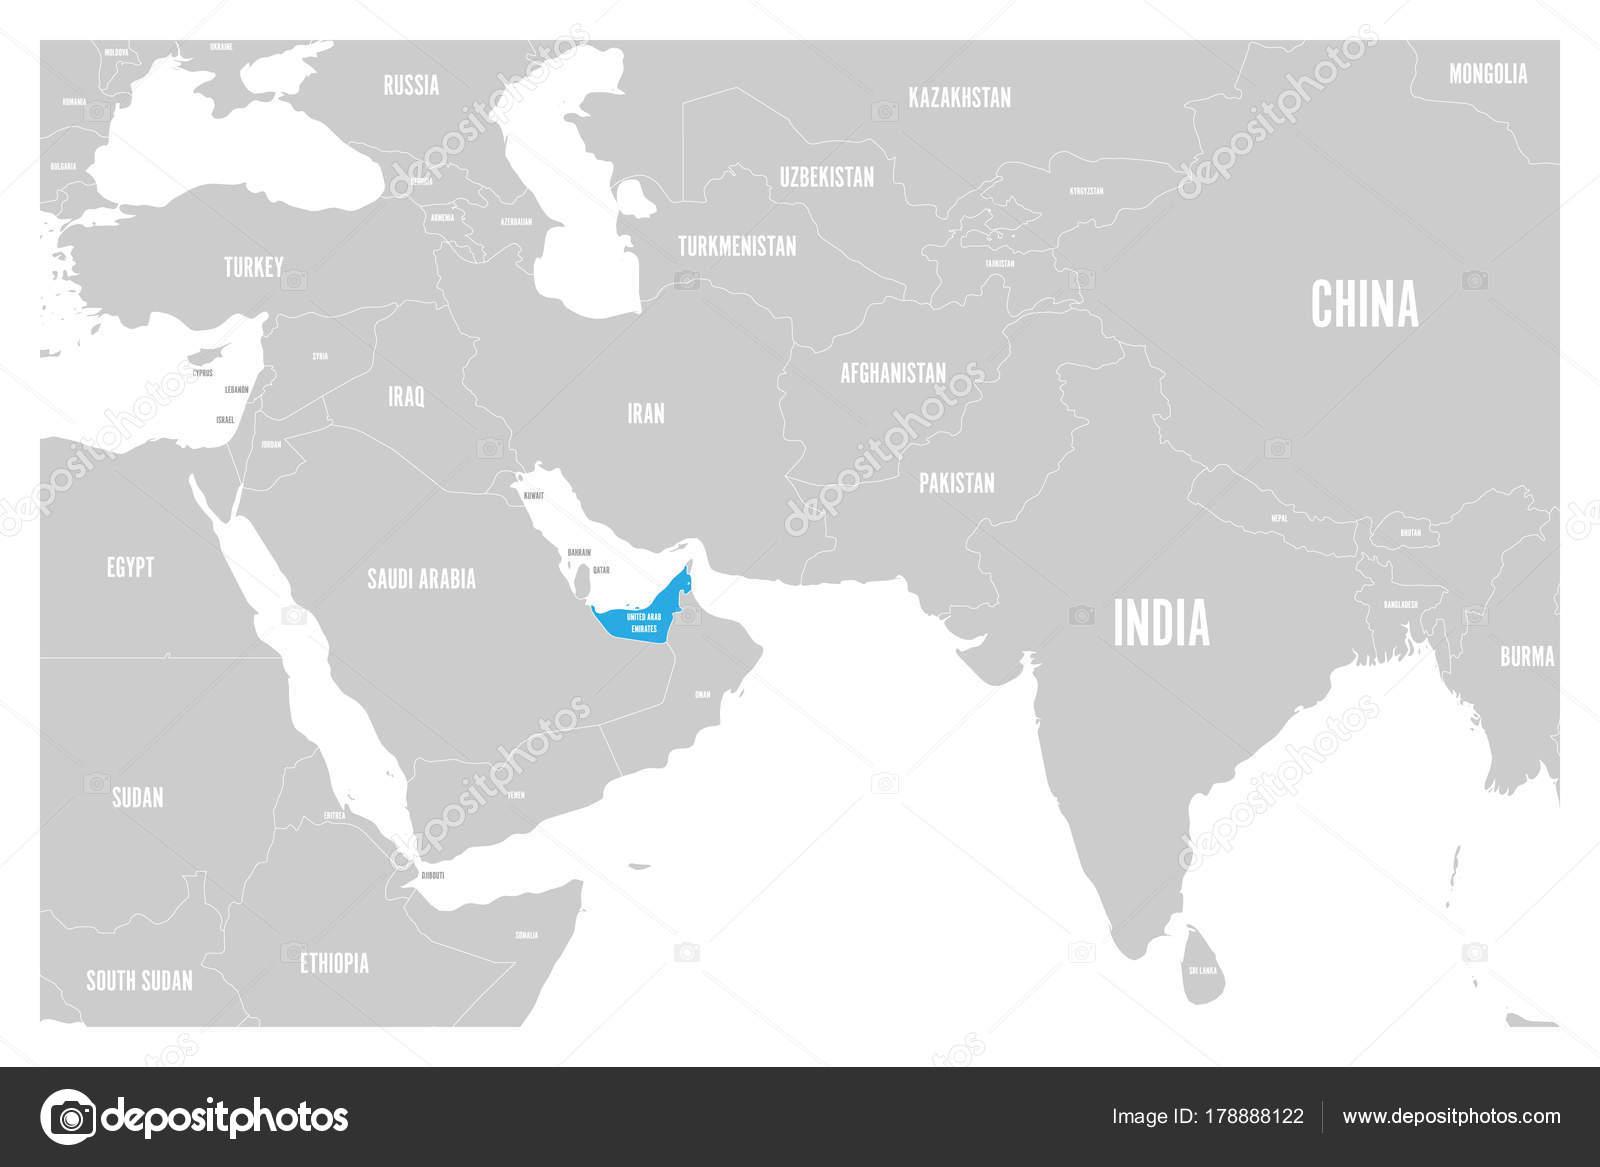 United Arab Emirates blue marked in political map of South ... on dubai map, persian gulf, uae map, bahamas map, tunisia map, ras al-khaimah, bangladesh map, burj al-arab, middle east, oman map, iran map, great britain map, saudi arabia map, yemen map, bahrain map, india map, saudi arabia, hong kong map, burj khalifa, sharjah map, finland map, arabian peninsula, gibraltar map, mali map, abu dhabi, niue map, dubai international airport, states of america map, syria map,